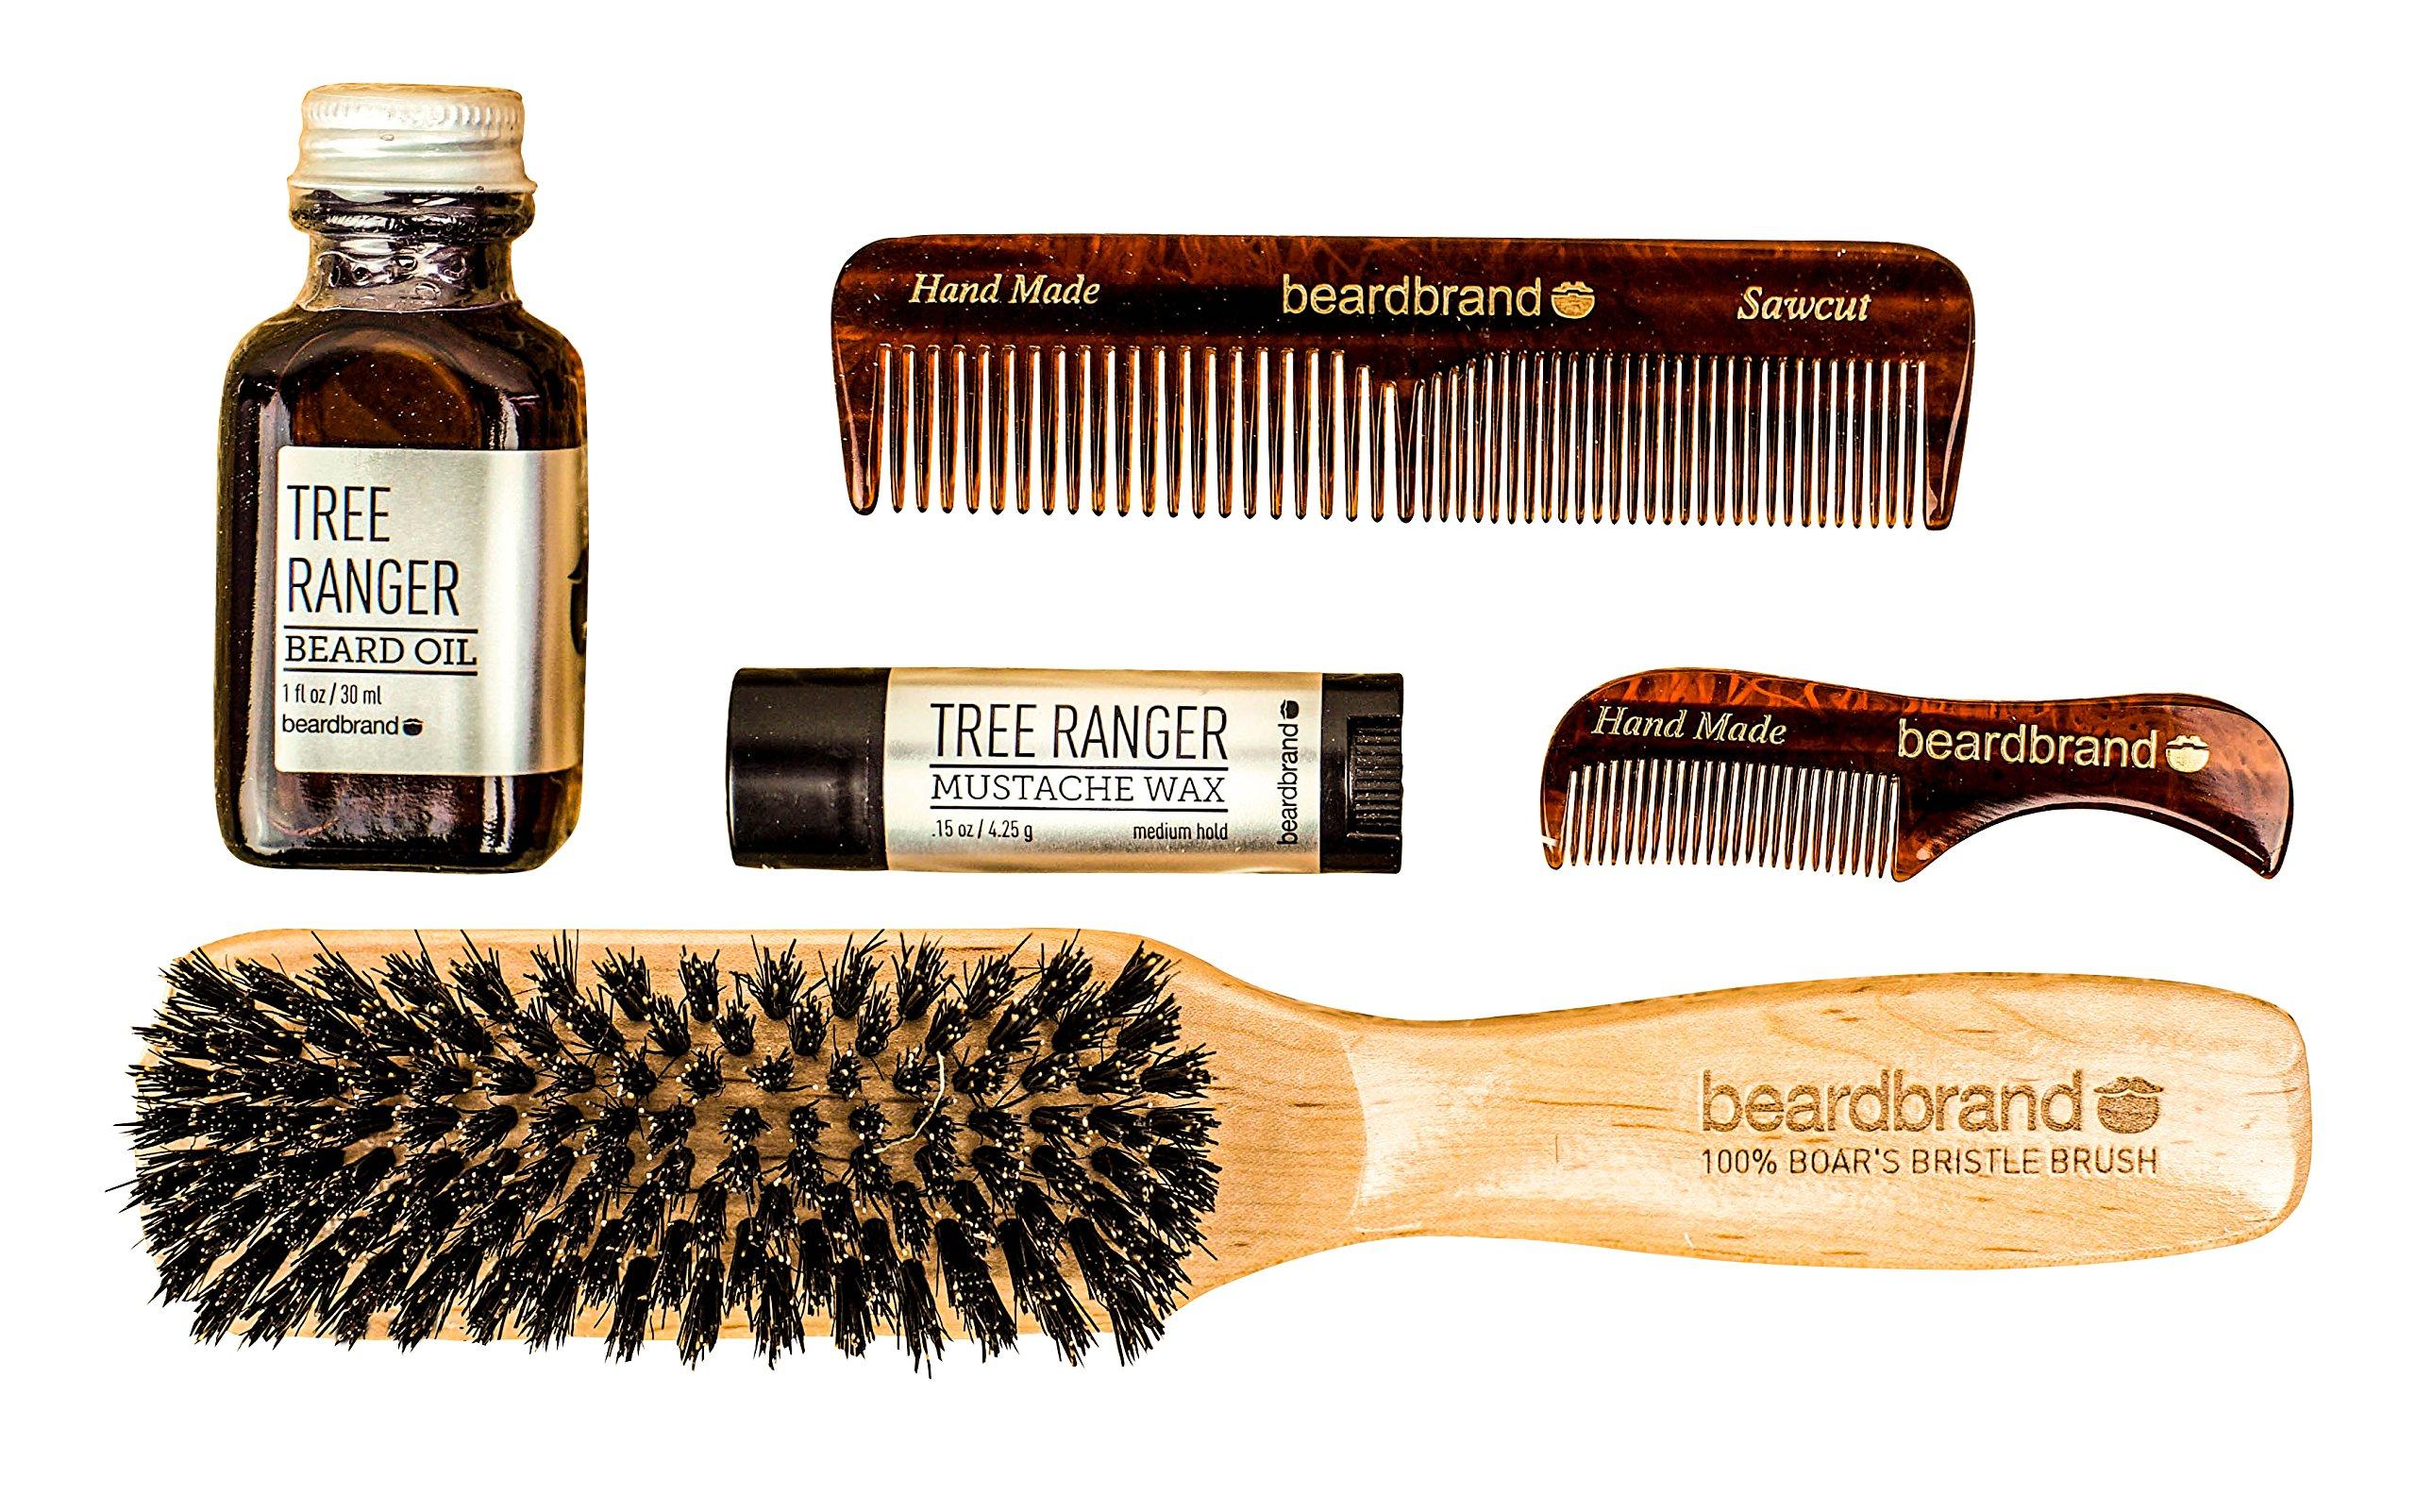 Beard Care Grooming Gift (5 Piece Kit) - All in one Beard Grooming Set - Great Gift For Men - Groomsman Gift